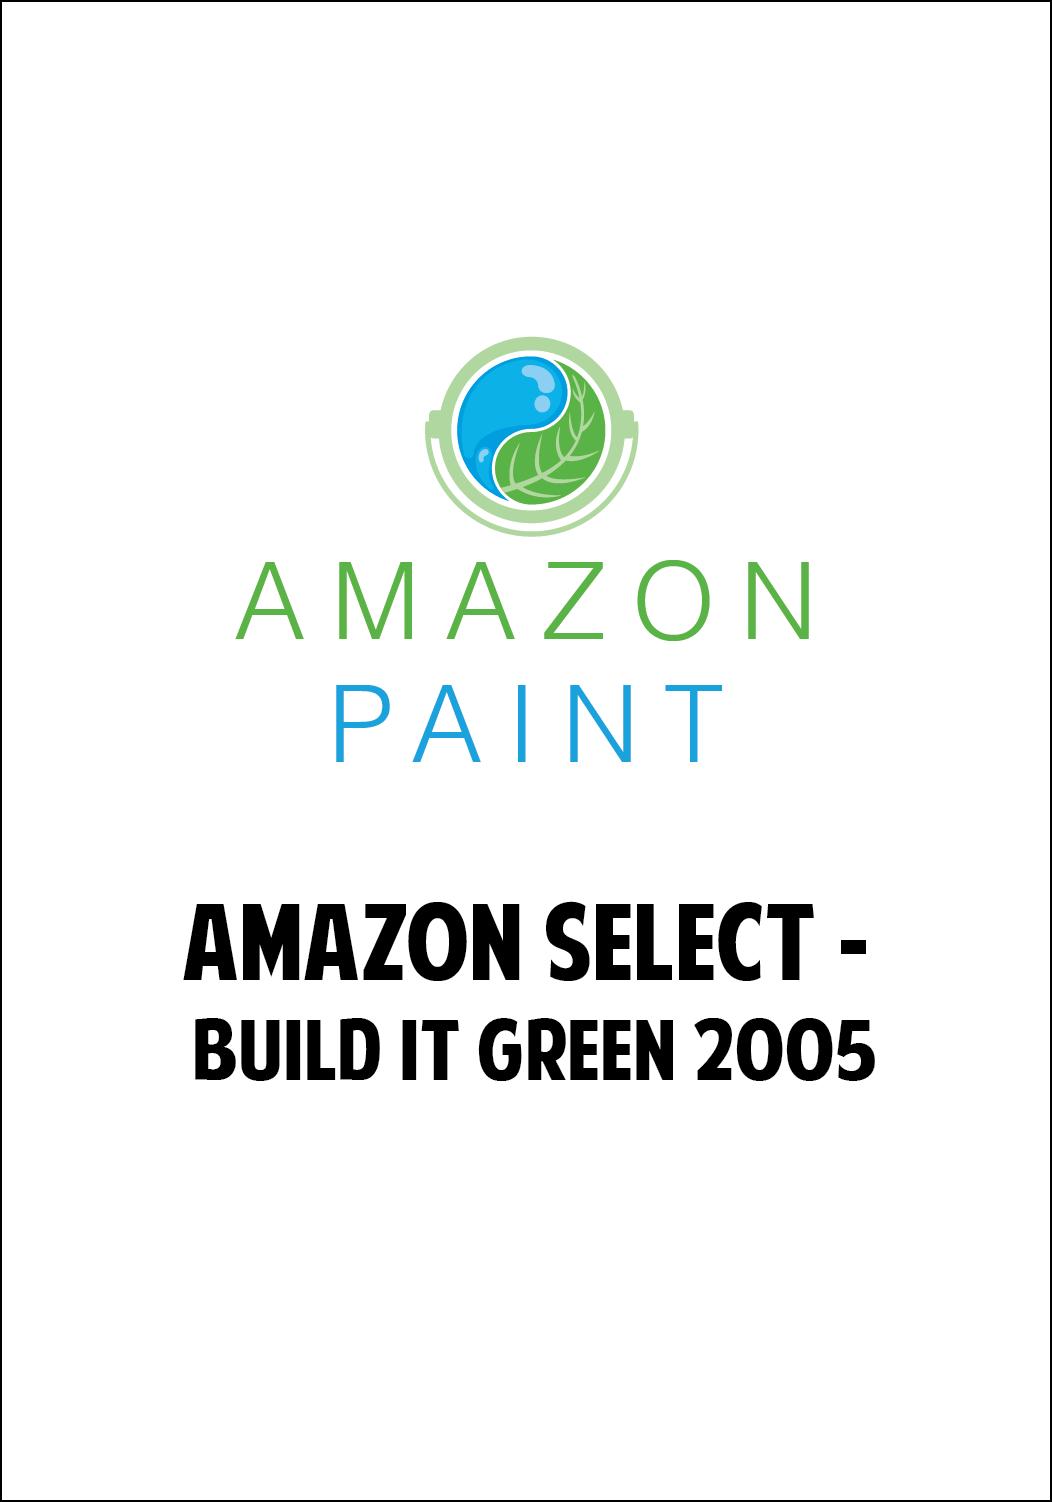 Amazon Select - Build it Green 2005